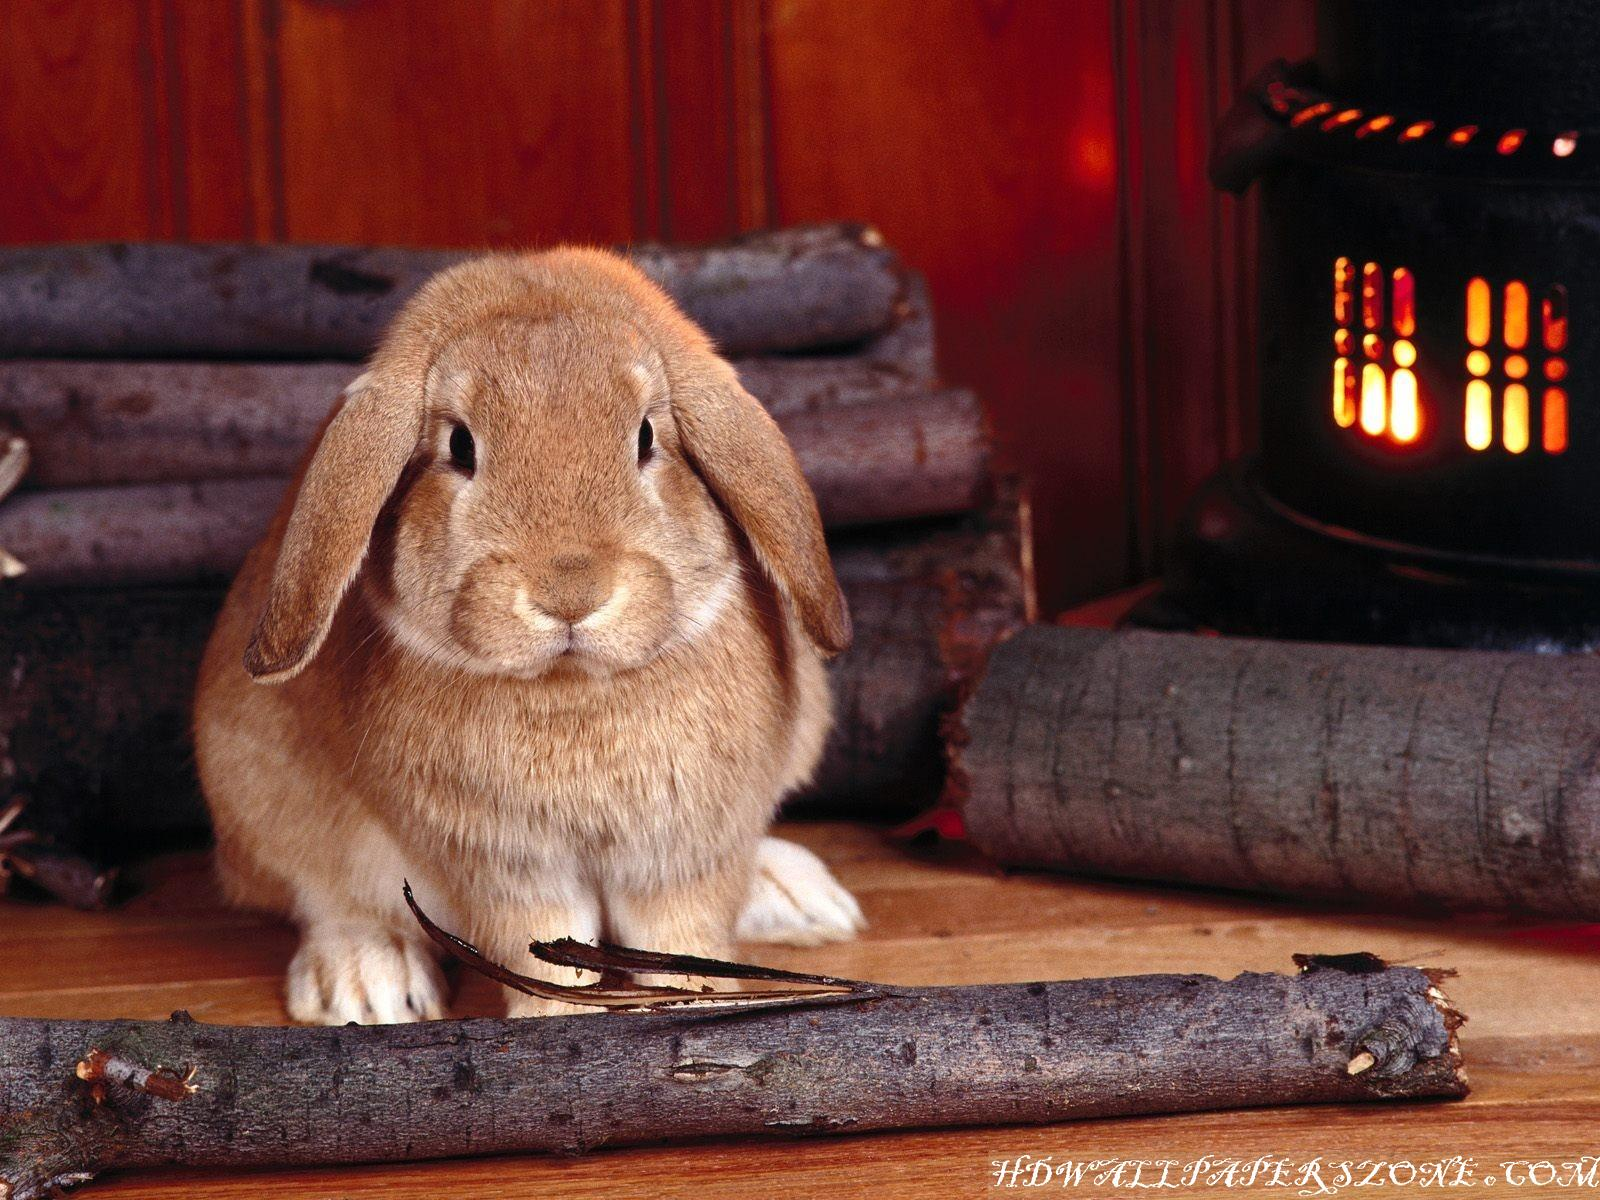 https://4.bp.blogspot.com/-3gH_biUlssc/ToBrDf-hb7I/AAAAAAAAAPo/ovZjNed4vjQ/s1600/HD+ANIMALS+WALLPAPERS+%252828%2529.jpg